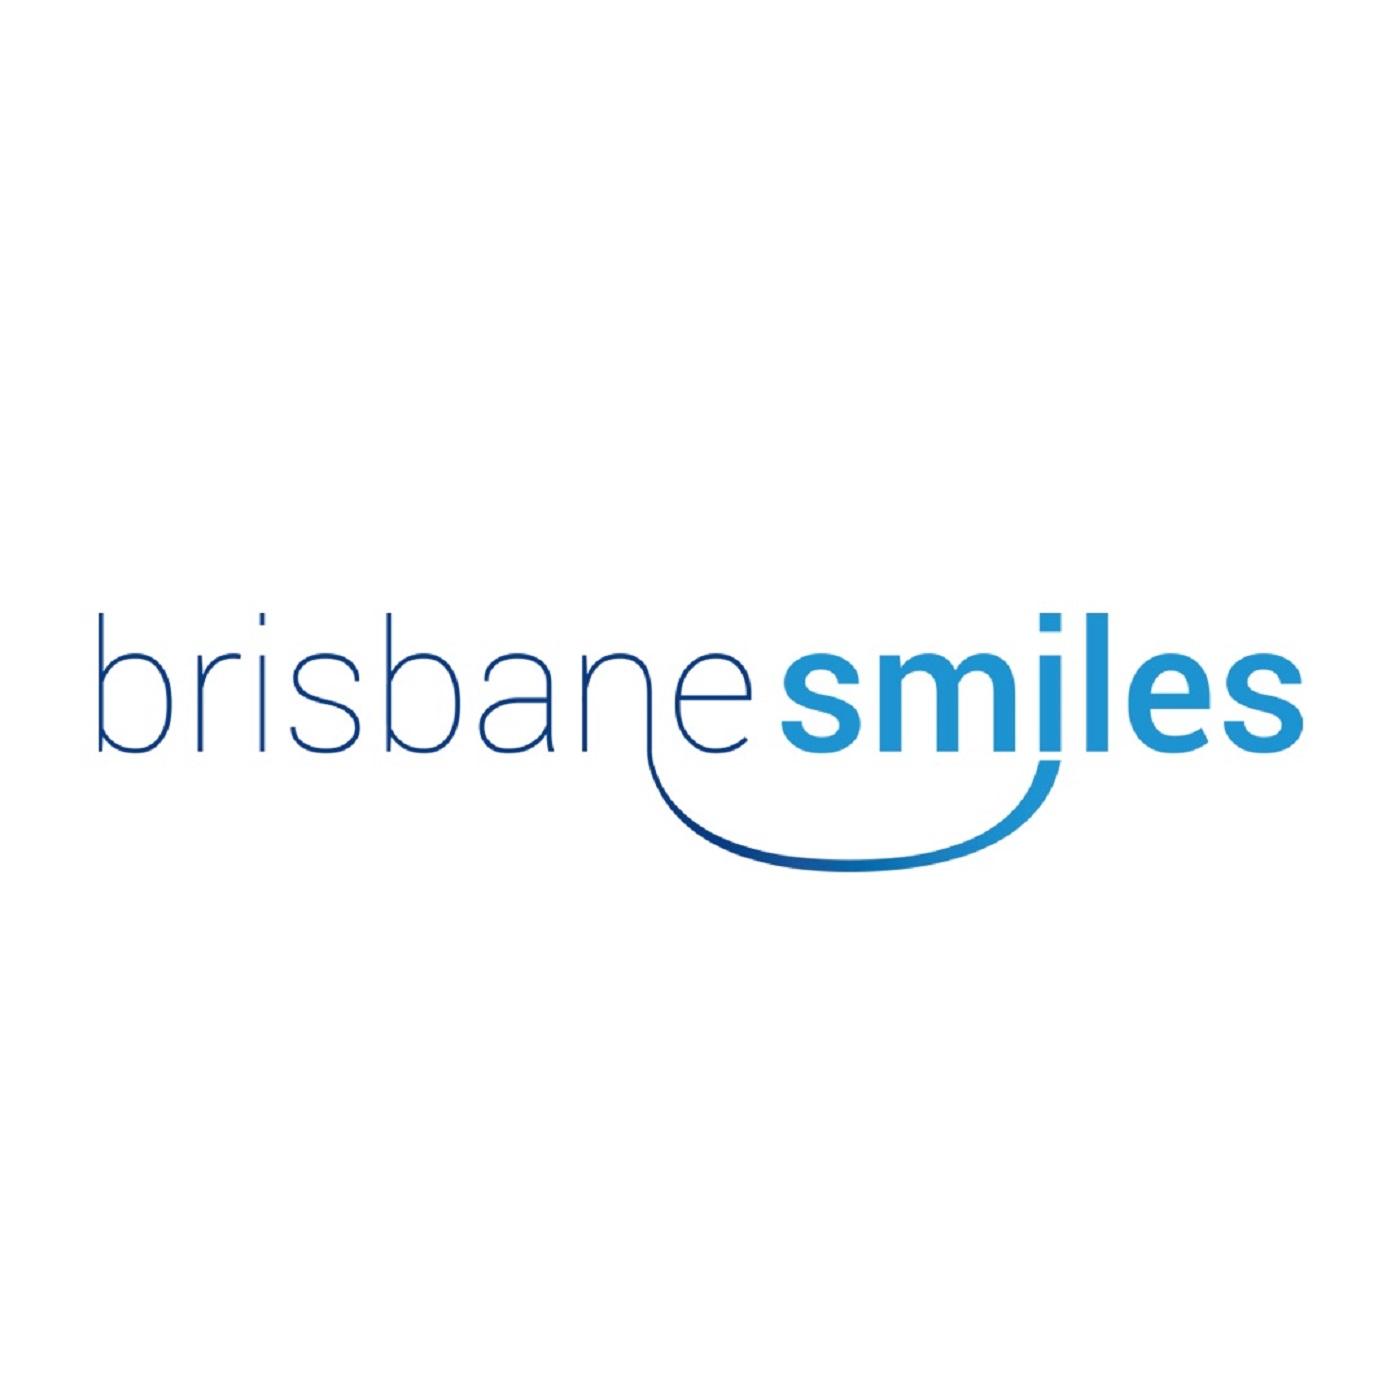 Brisbane smiles